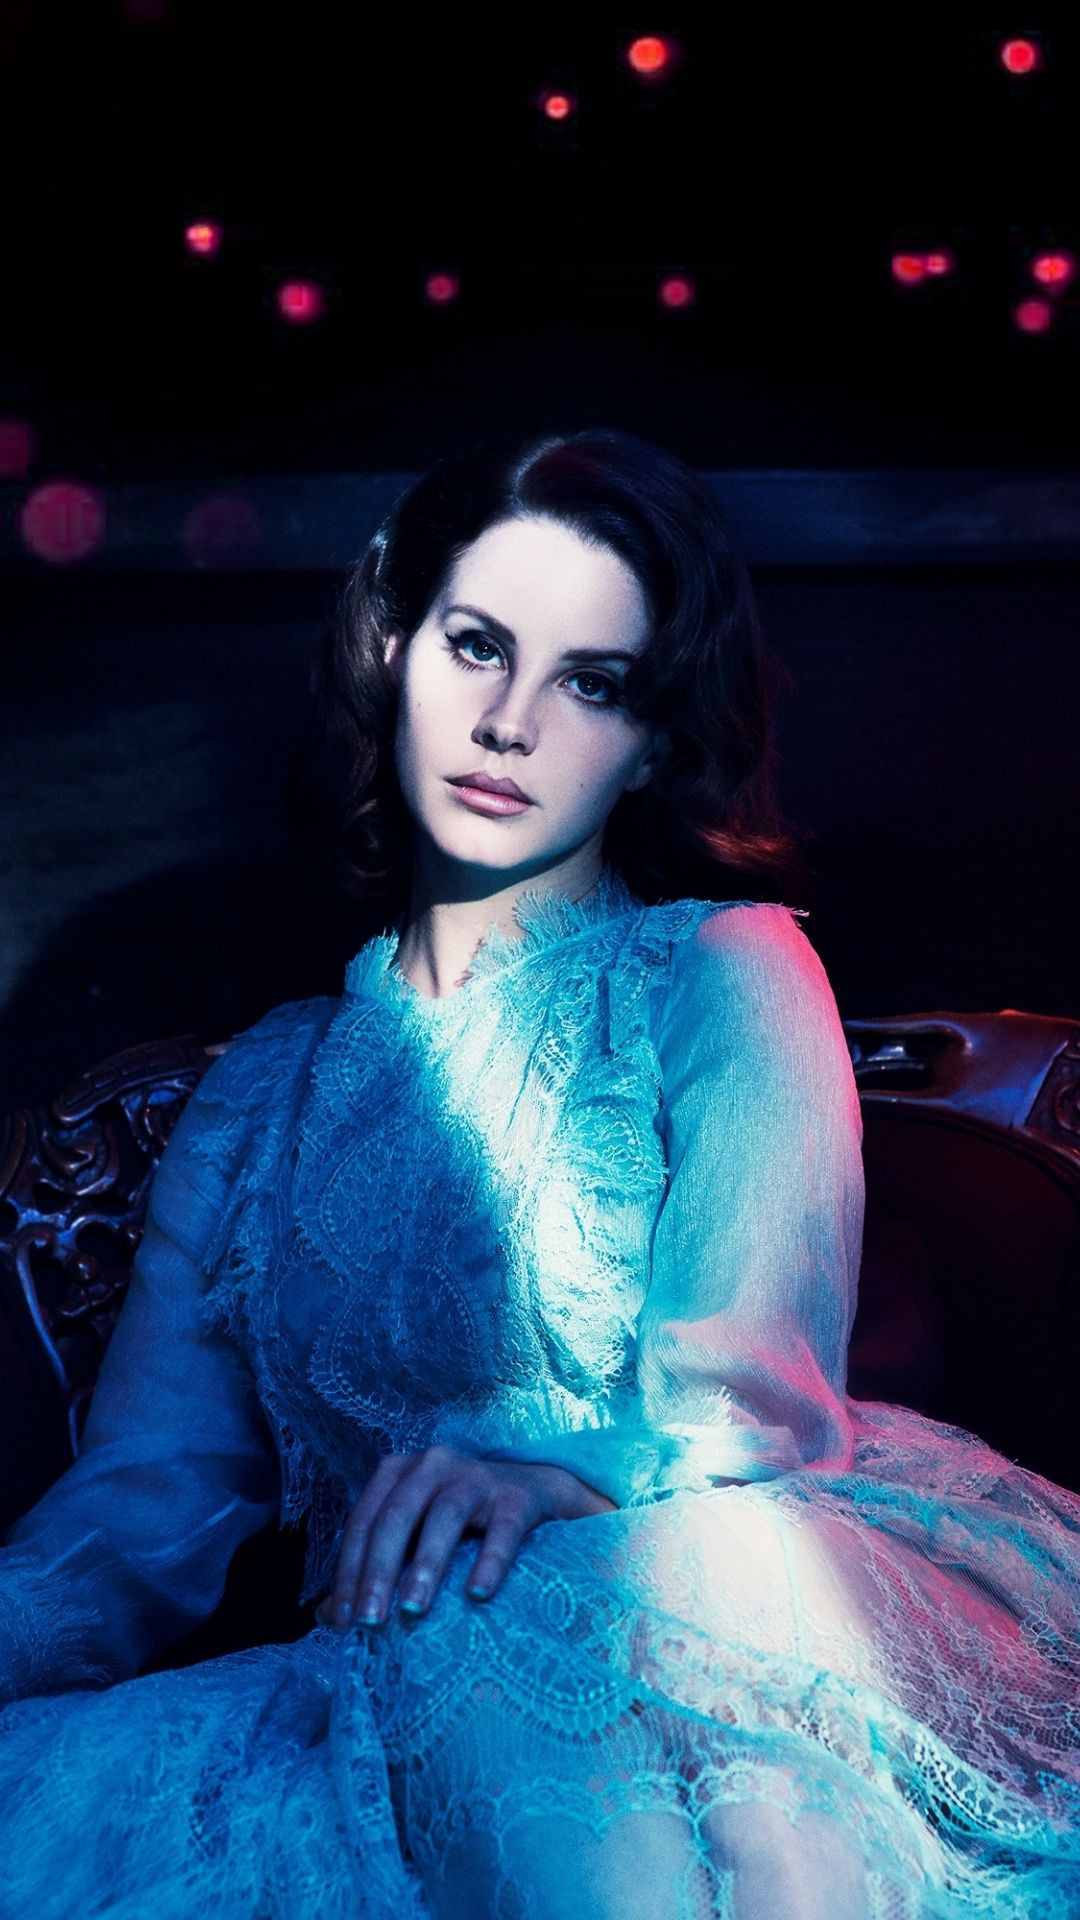 Lana Del Rey Celebrity Complex Magazine 1080x1920 Wallpaper